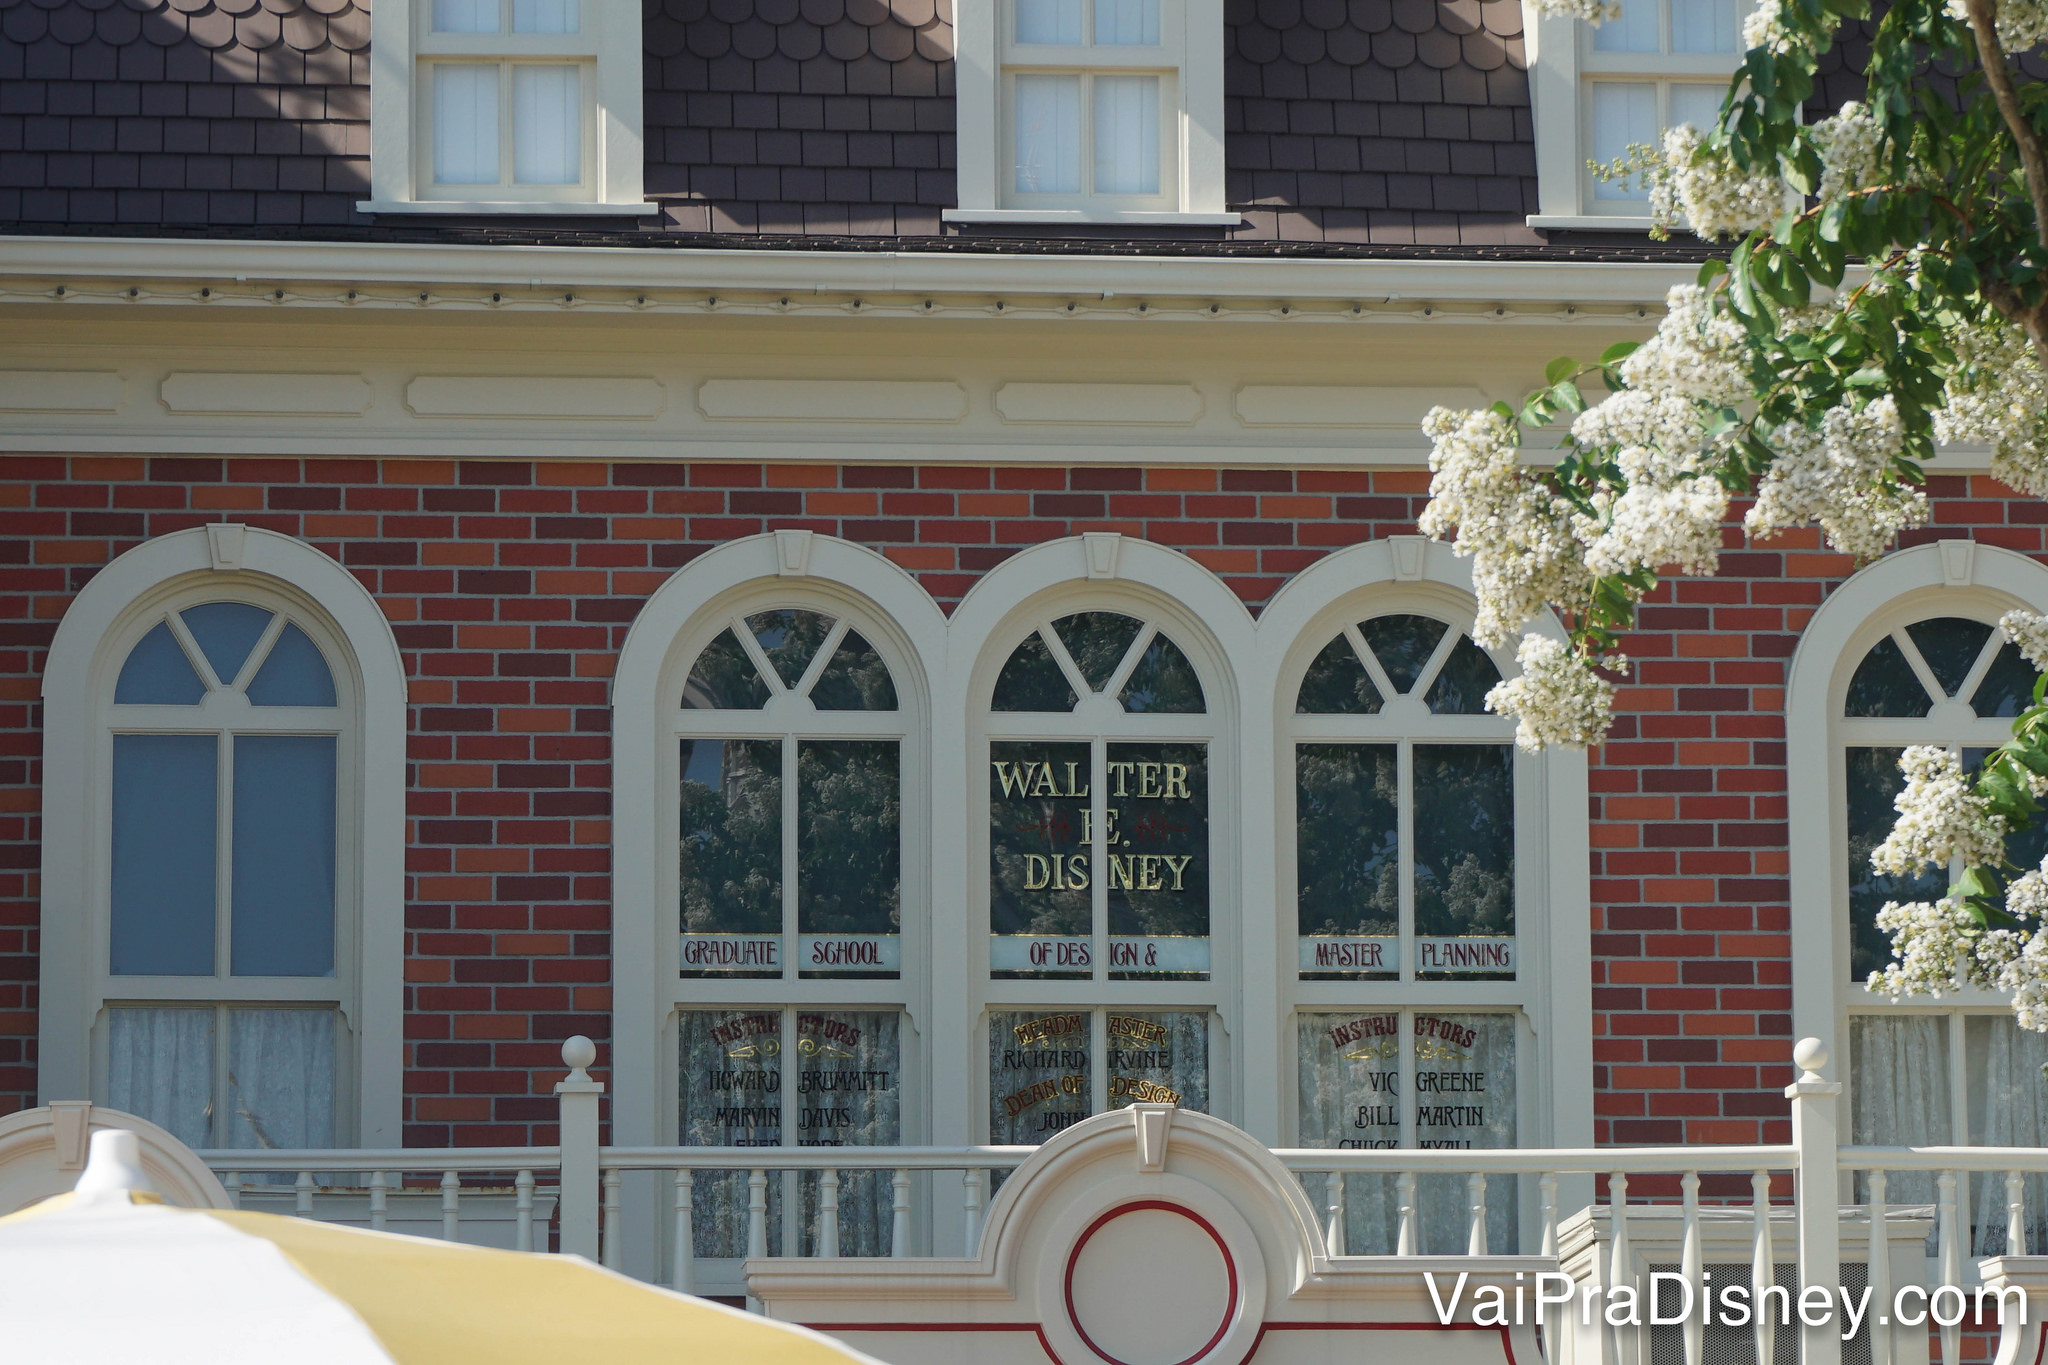 Janela do Walt Disney na Main Street. Você já viu?